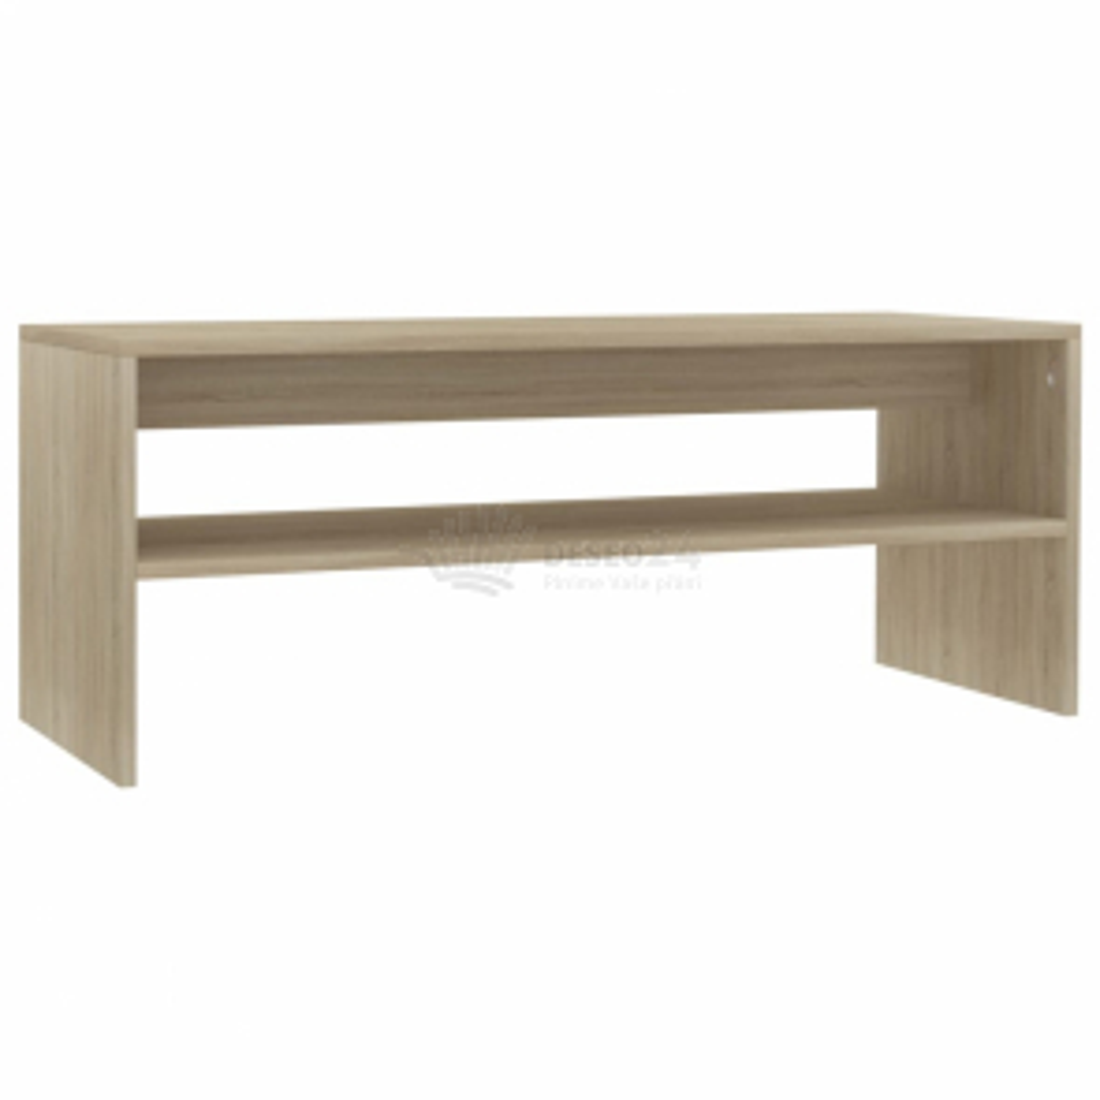 vidaXL Konferenční stolek dub sonoma 100 x 40 x 40 cm dřevotříska [800129]